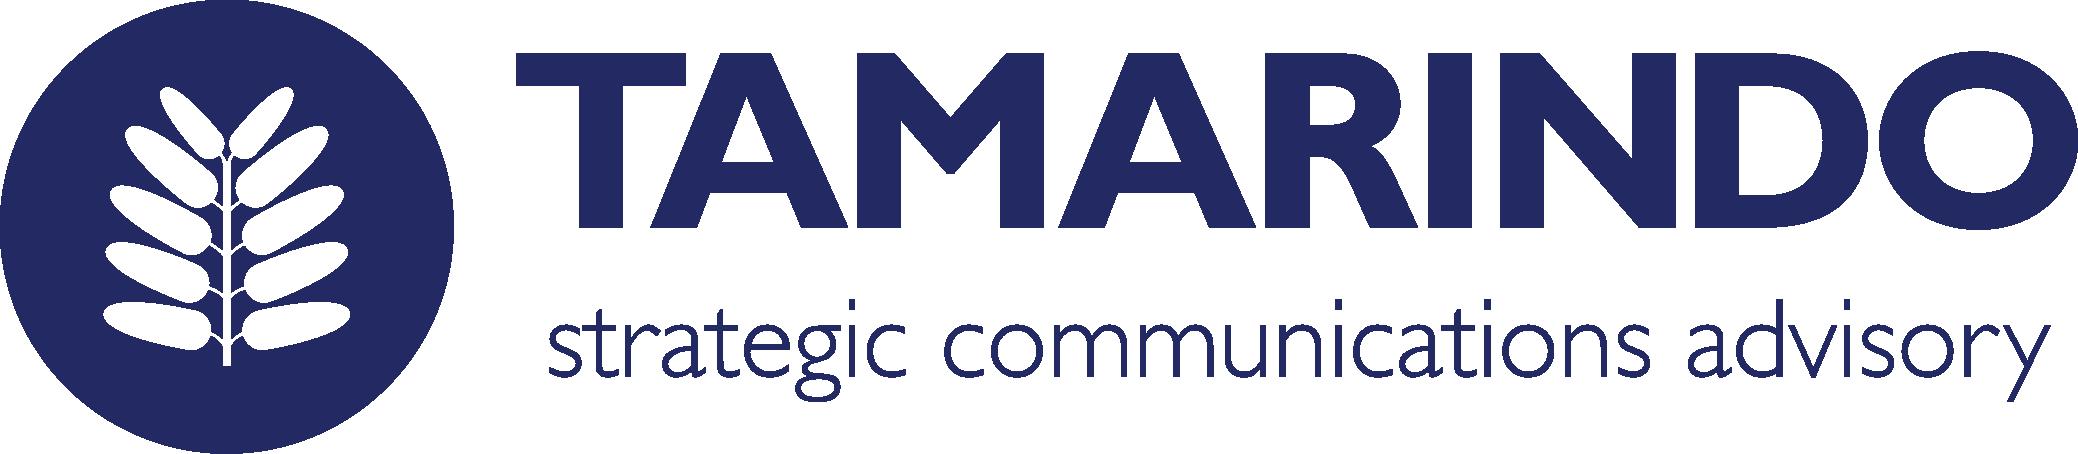 Tamarindo Comms logo